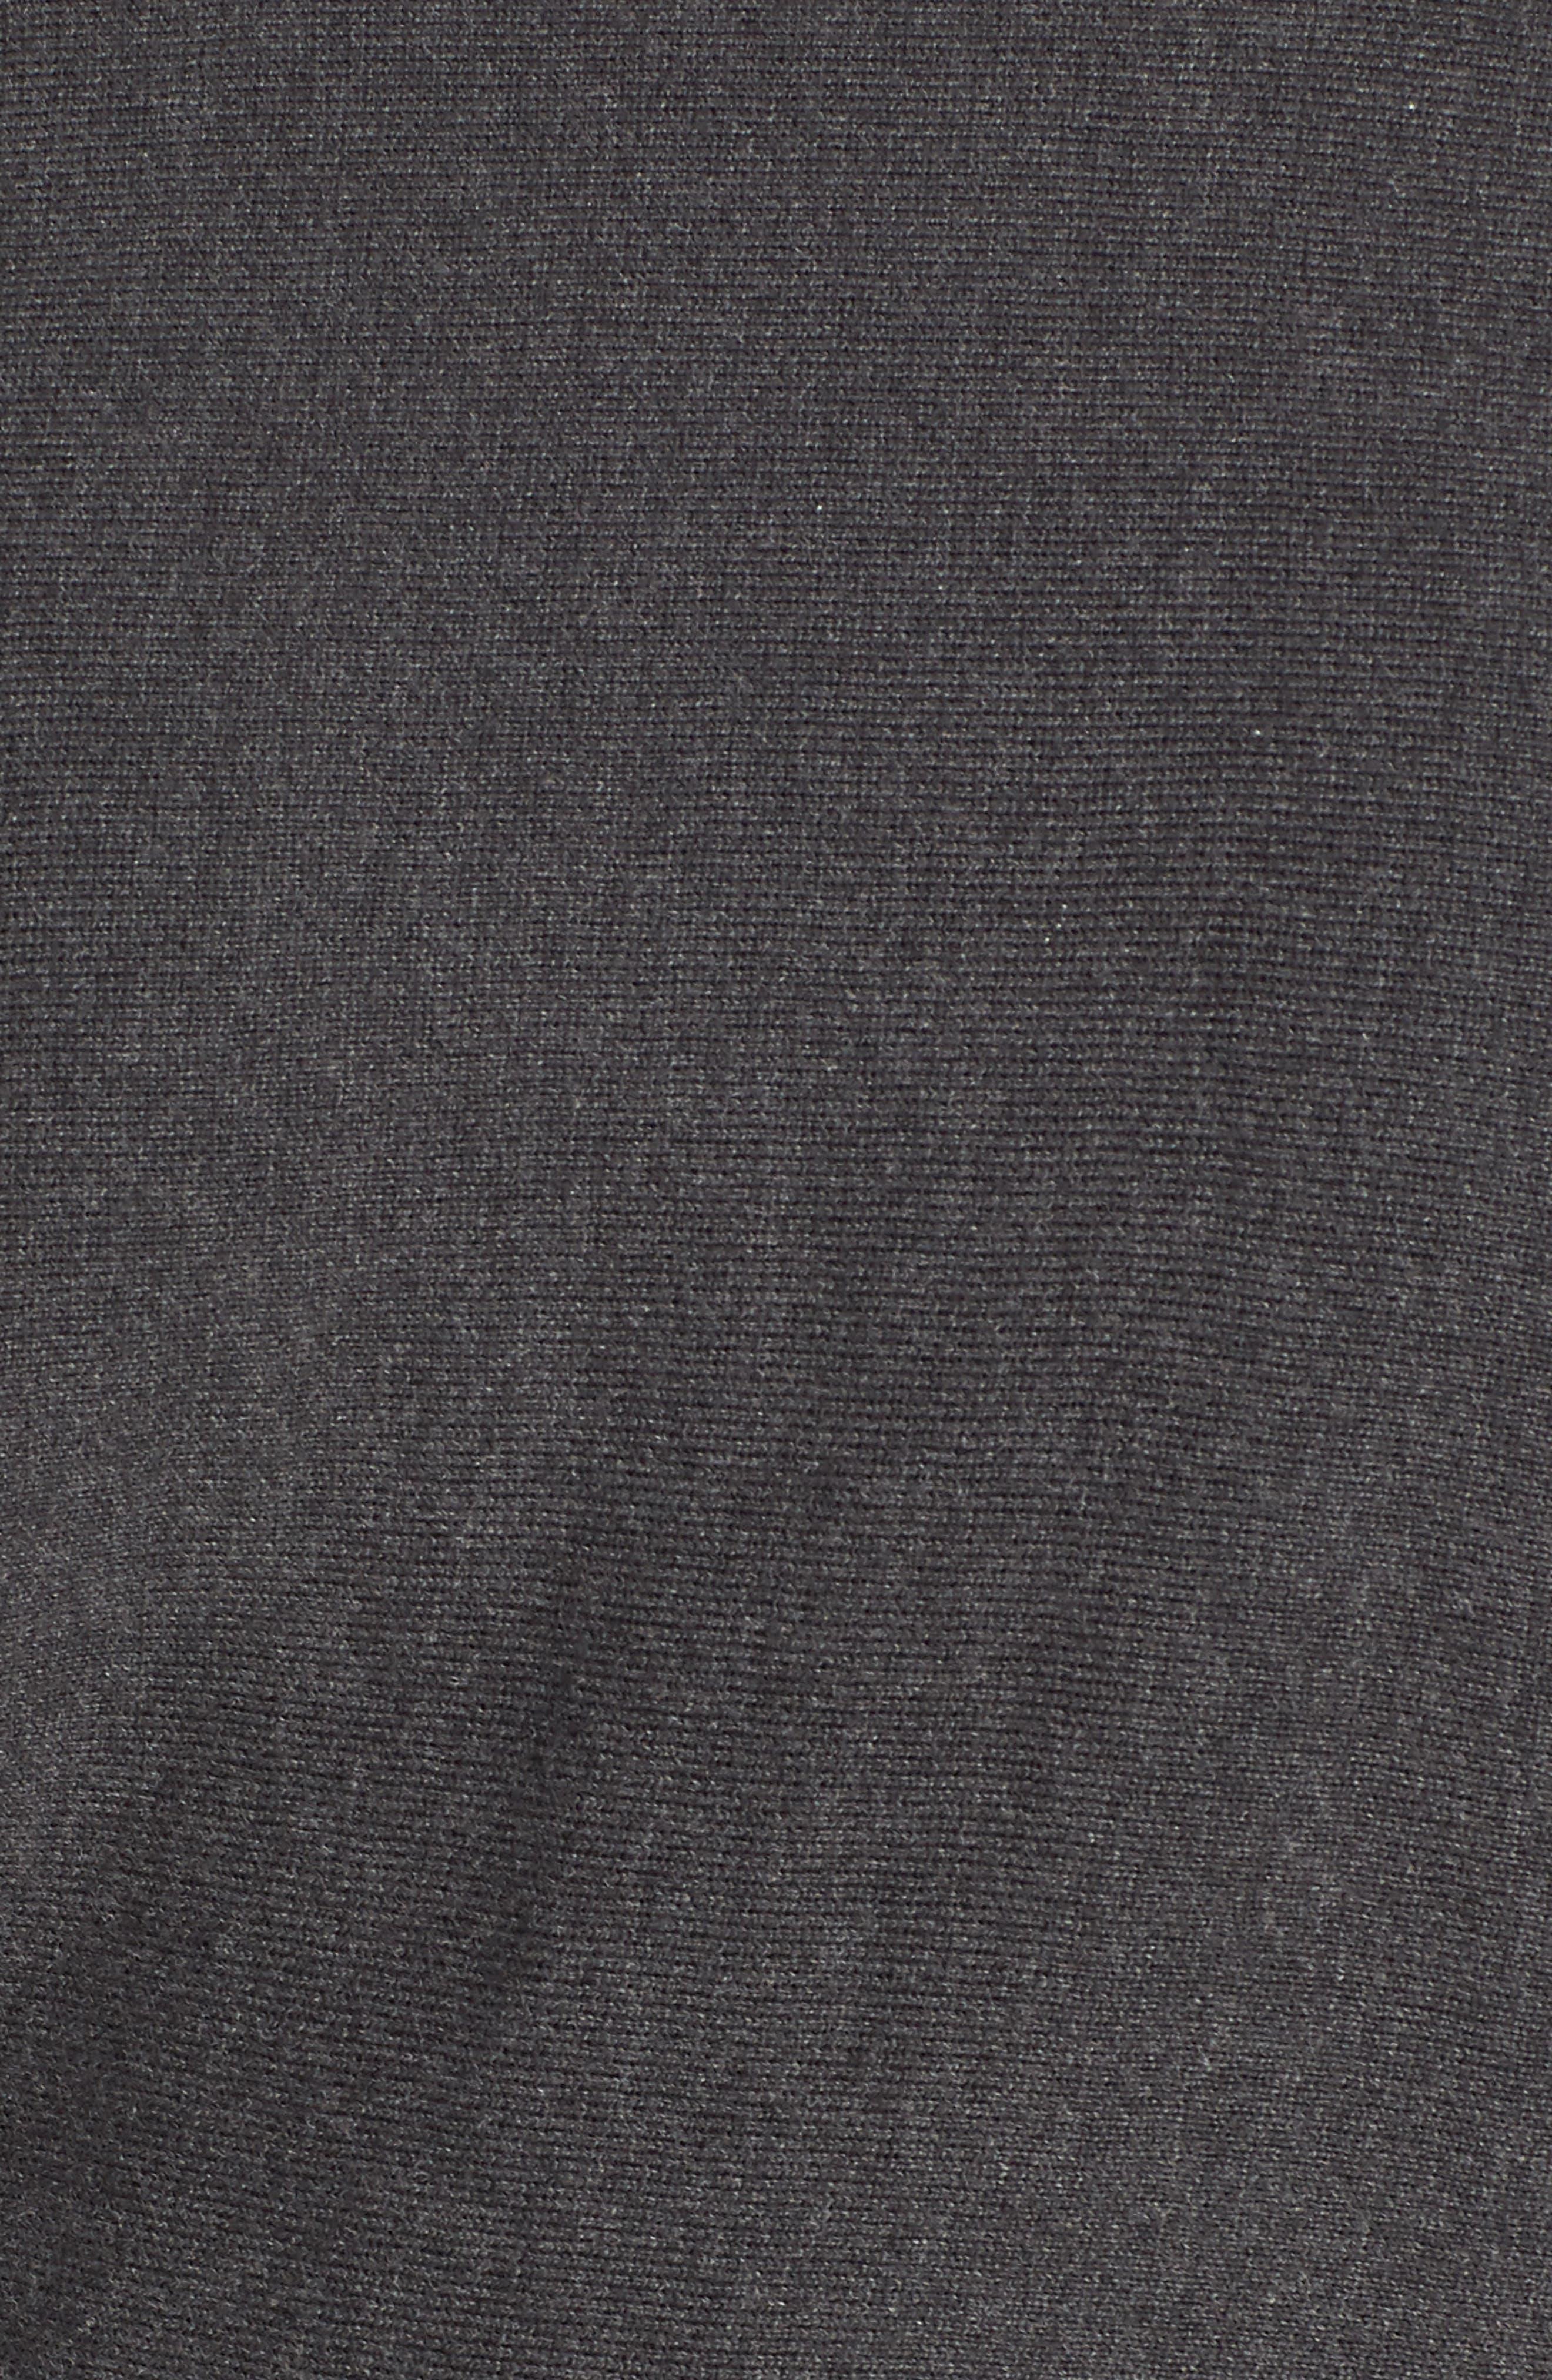 Cotton Blend Kimono Sweater,                             Alternate thumbnail 5, color,                             GREY DARK CHARCOAL HEATHER